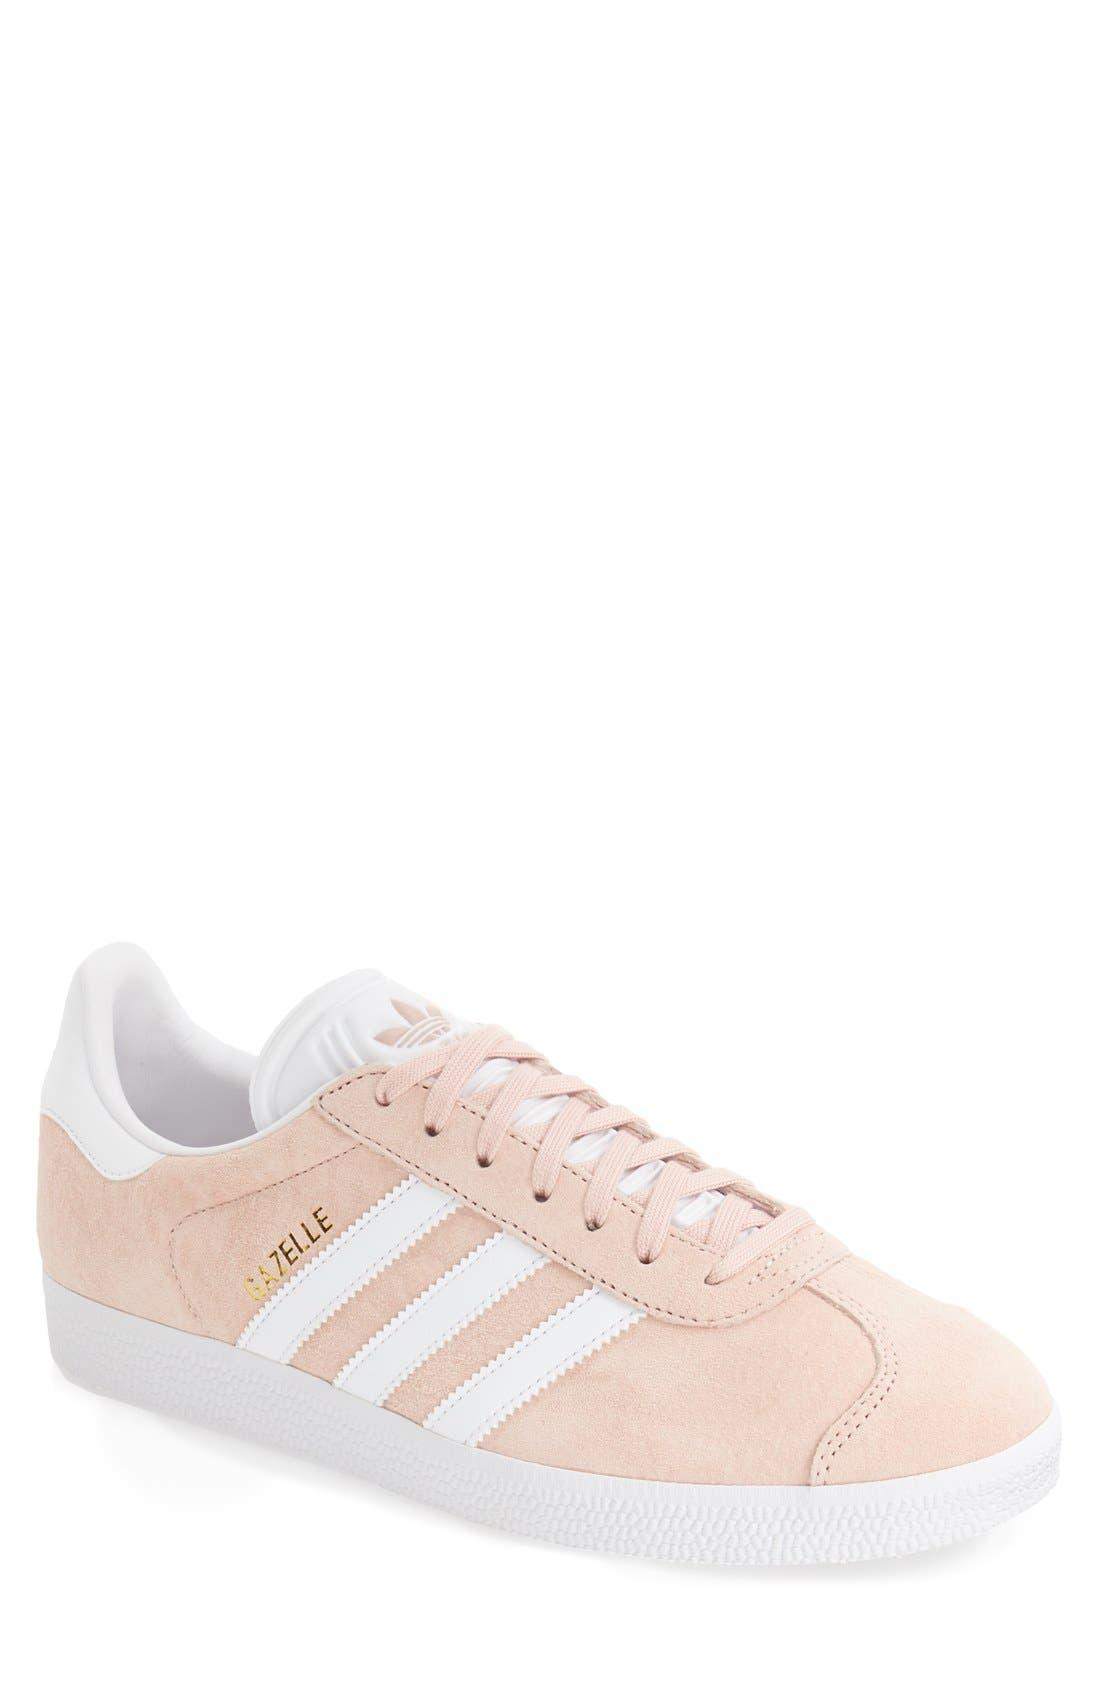 Gazelle Sneaker,                             Main thumbnail 1, color,                             Vapor Pink